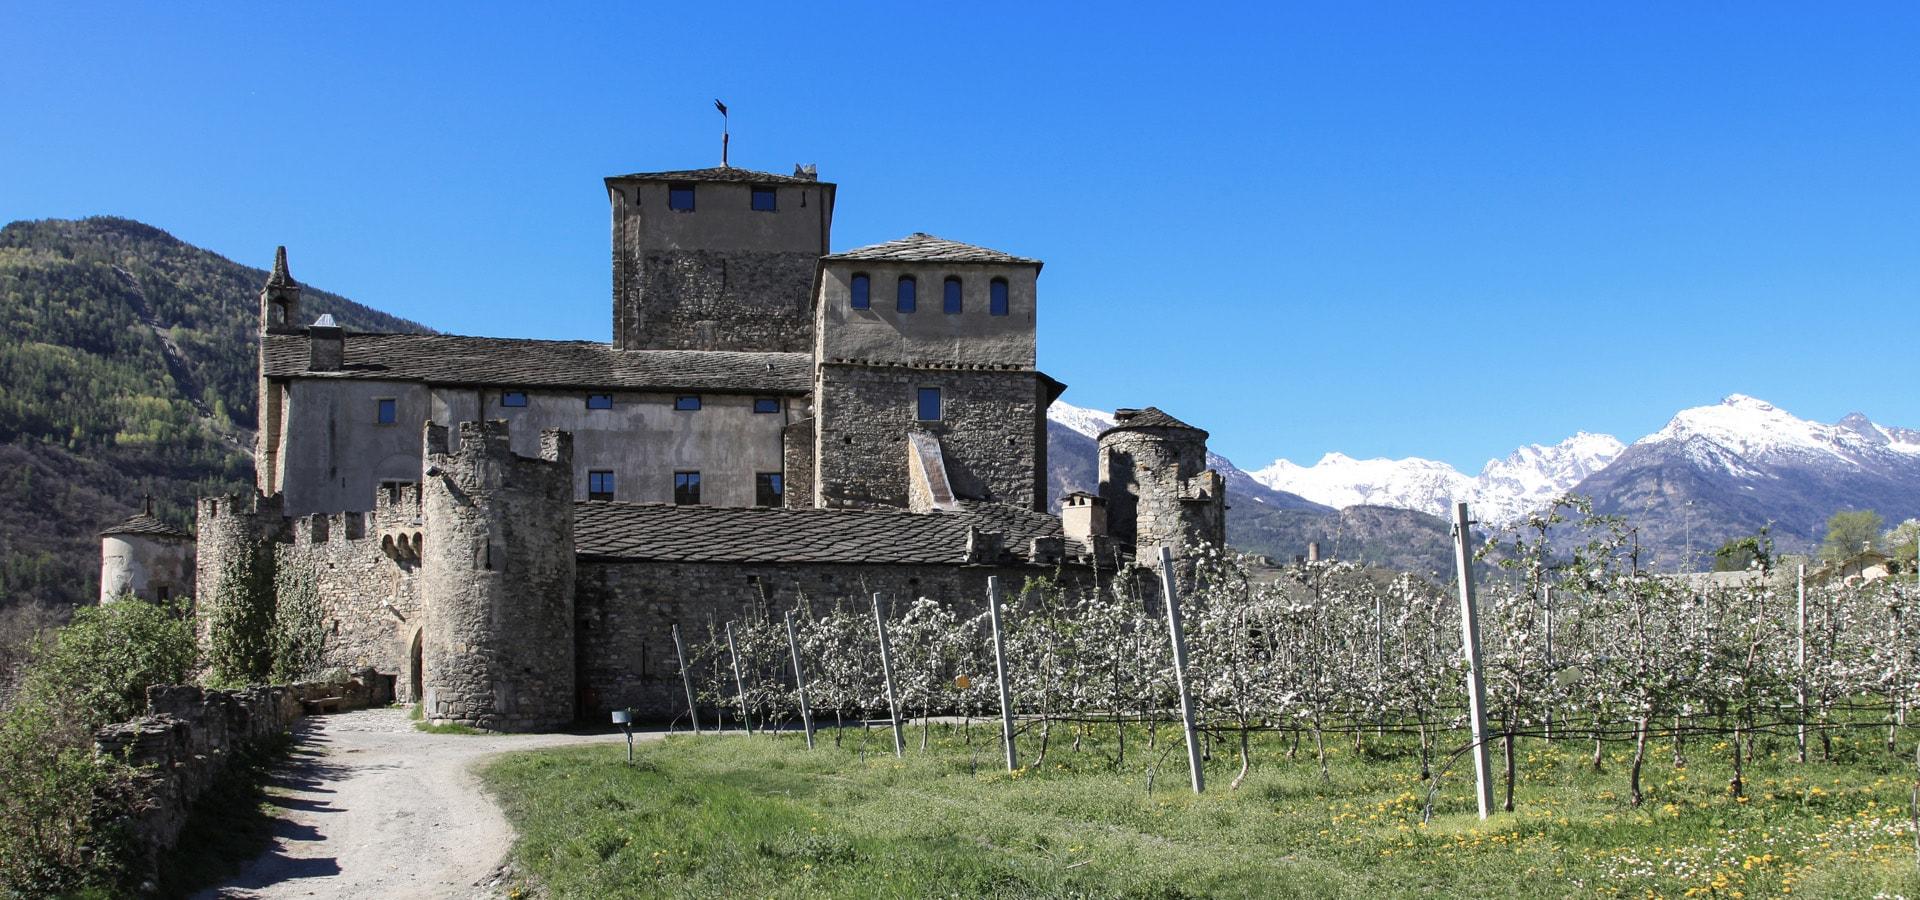 Itinerario d'autunno in Valle d'Aosta, tra castelli e buon cibo a Introd e dintorni